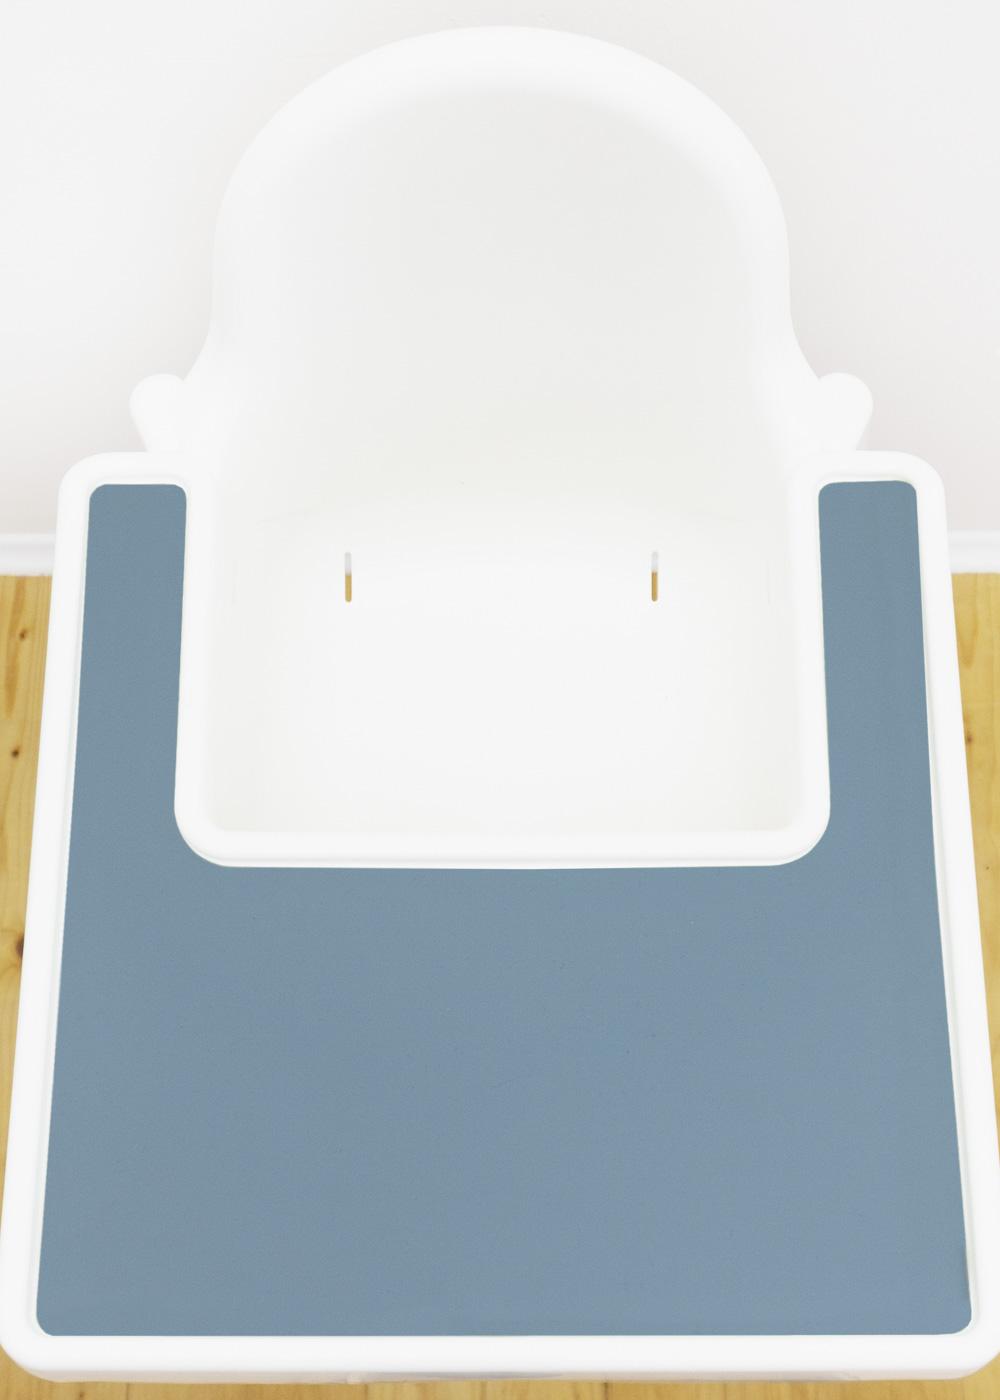 Silikonmatte Ikea Antilop Hochstuhl Klecka Mat nordisch blau Gesamtansicht oben